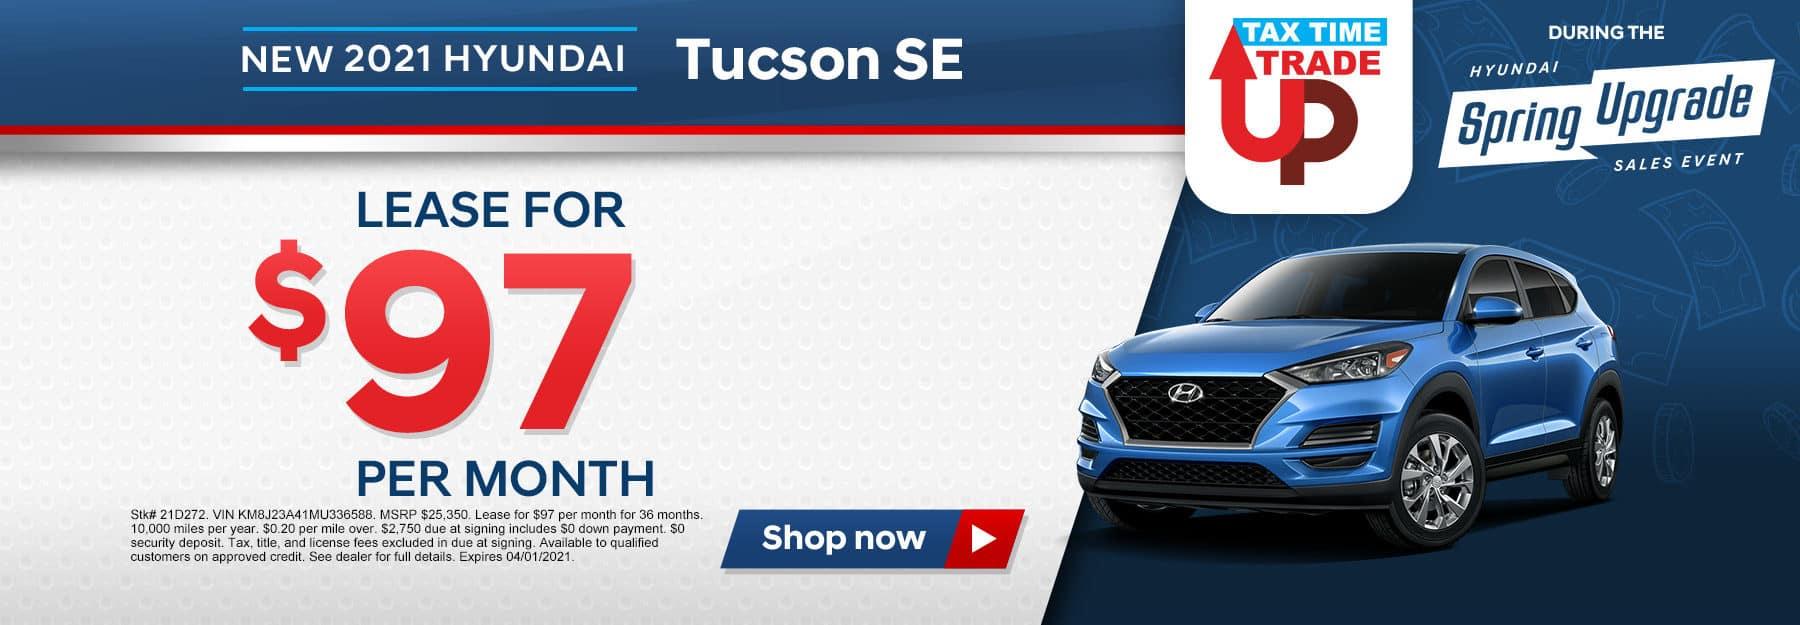 DennisHyundai_Slide_1800x625_03-21_Tucson